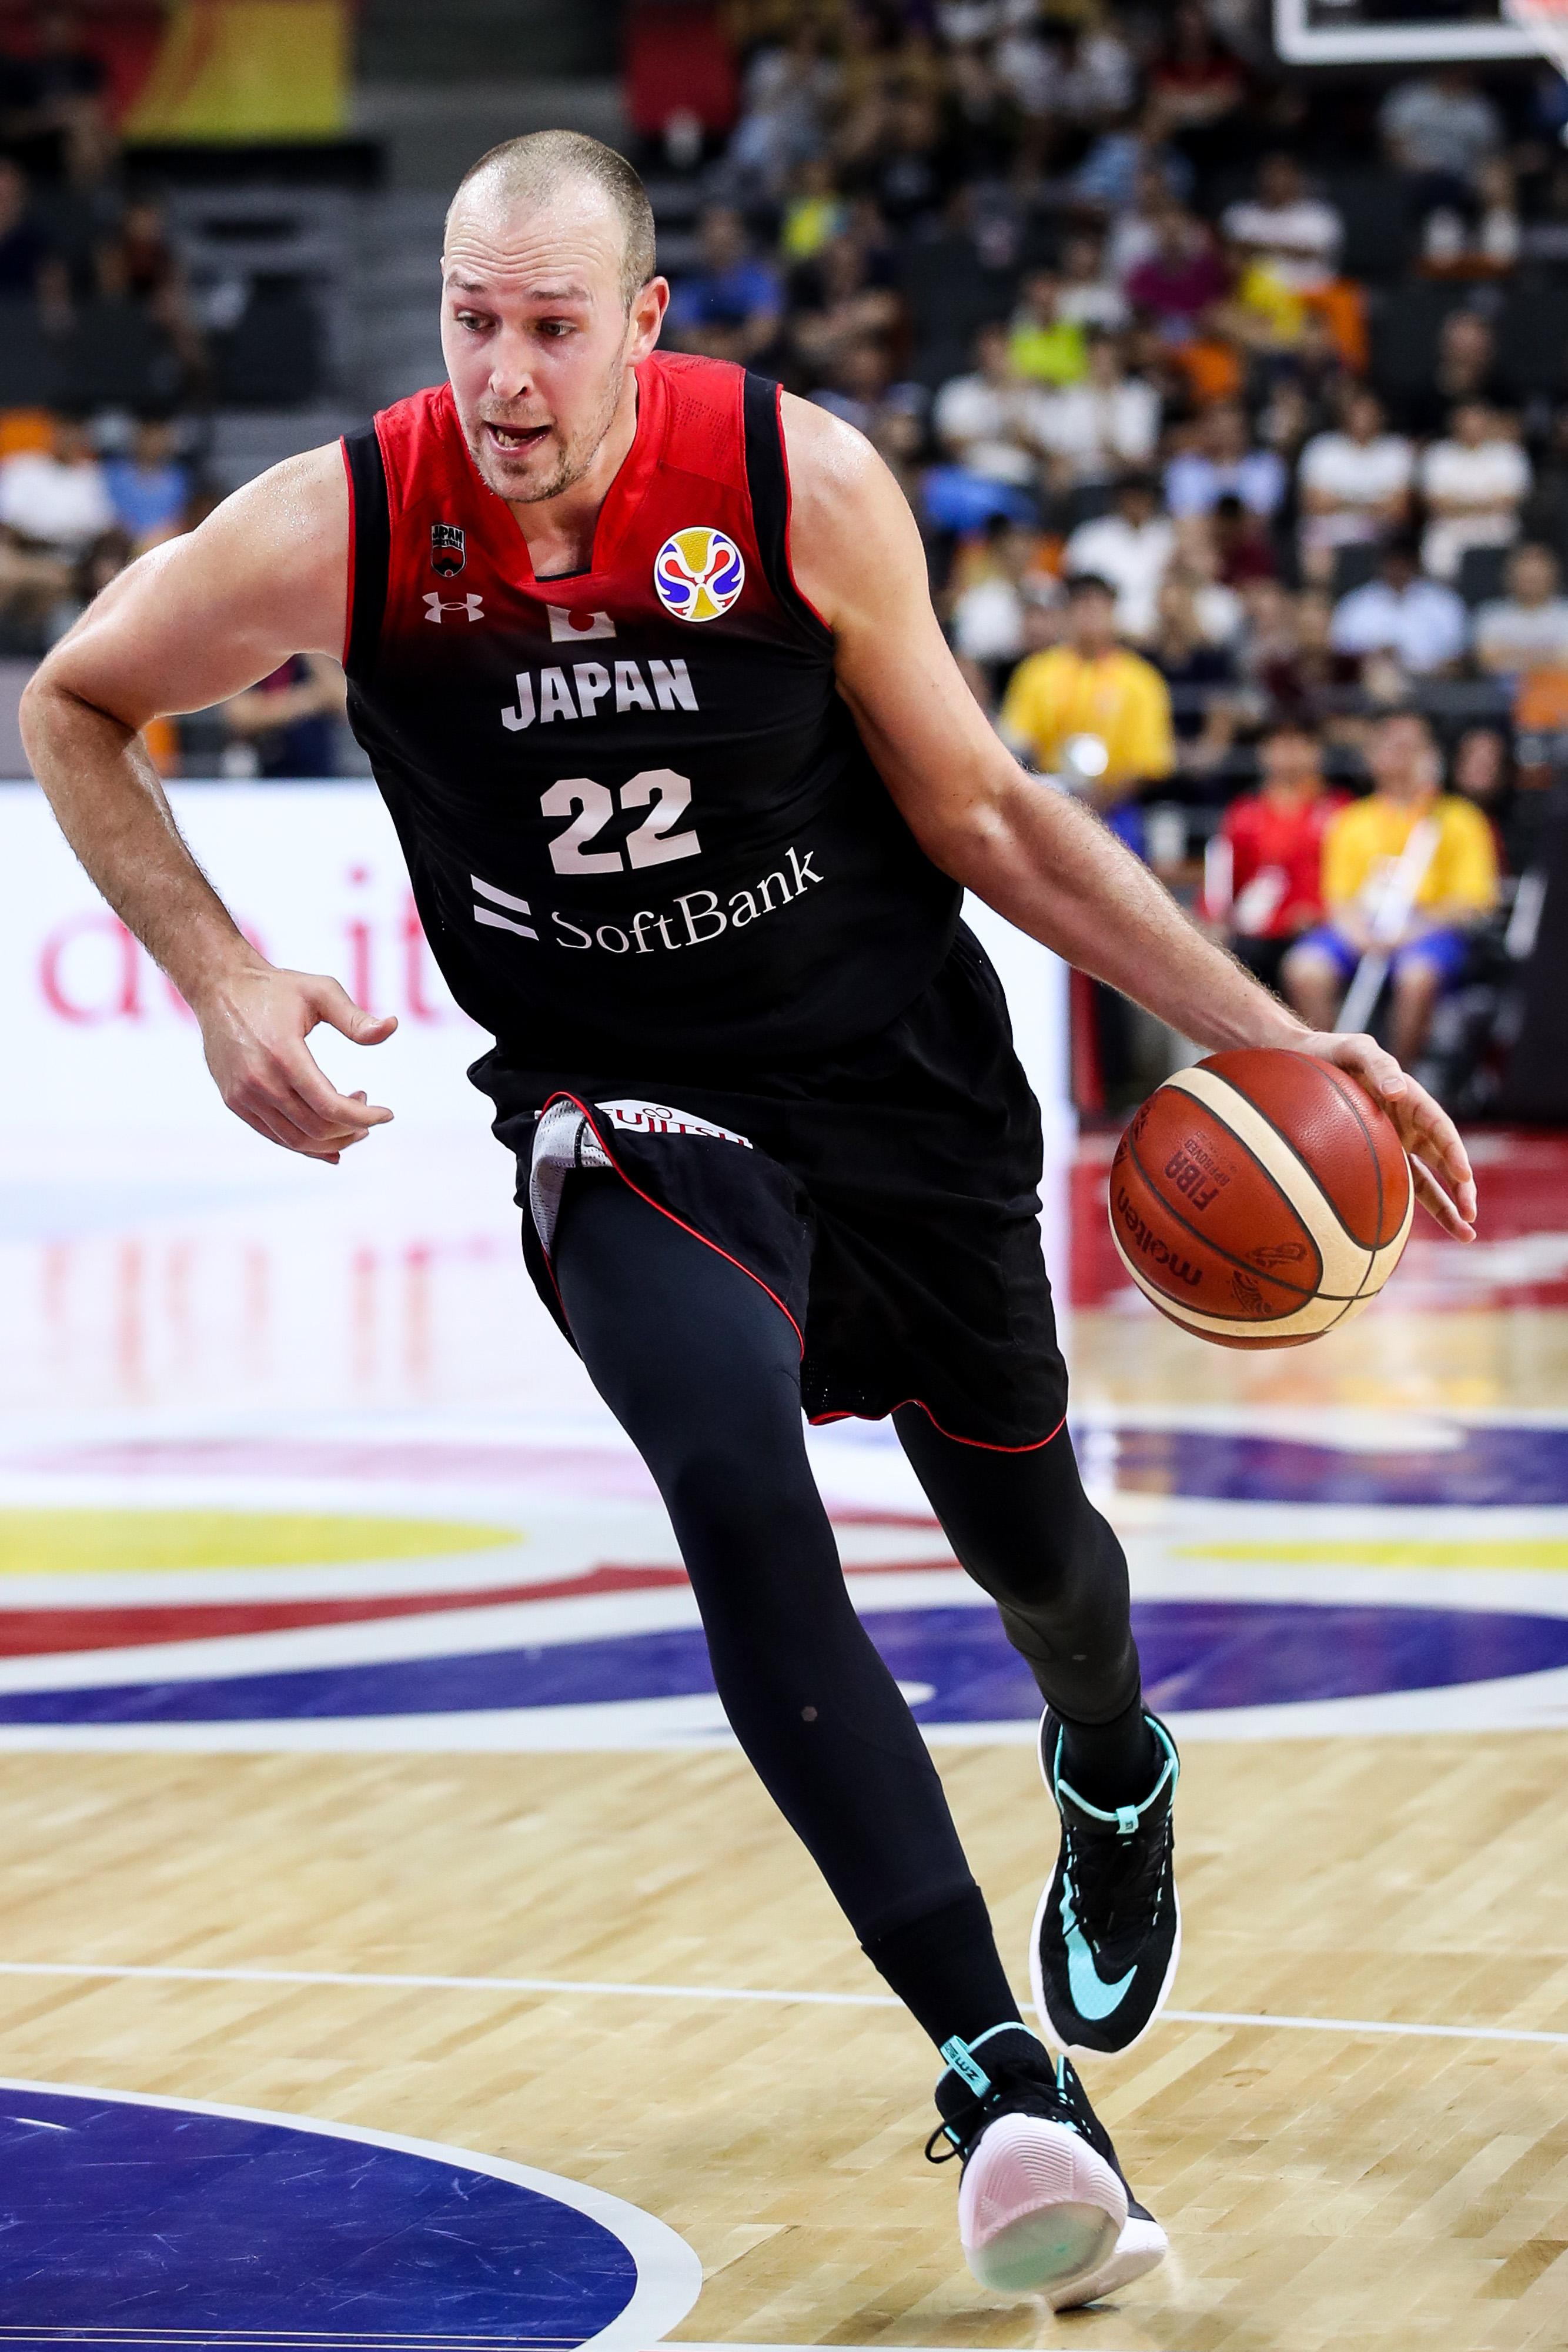 New Zealand v Japan: Group O - FIBA World Cup 2019